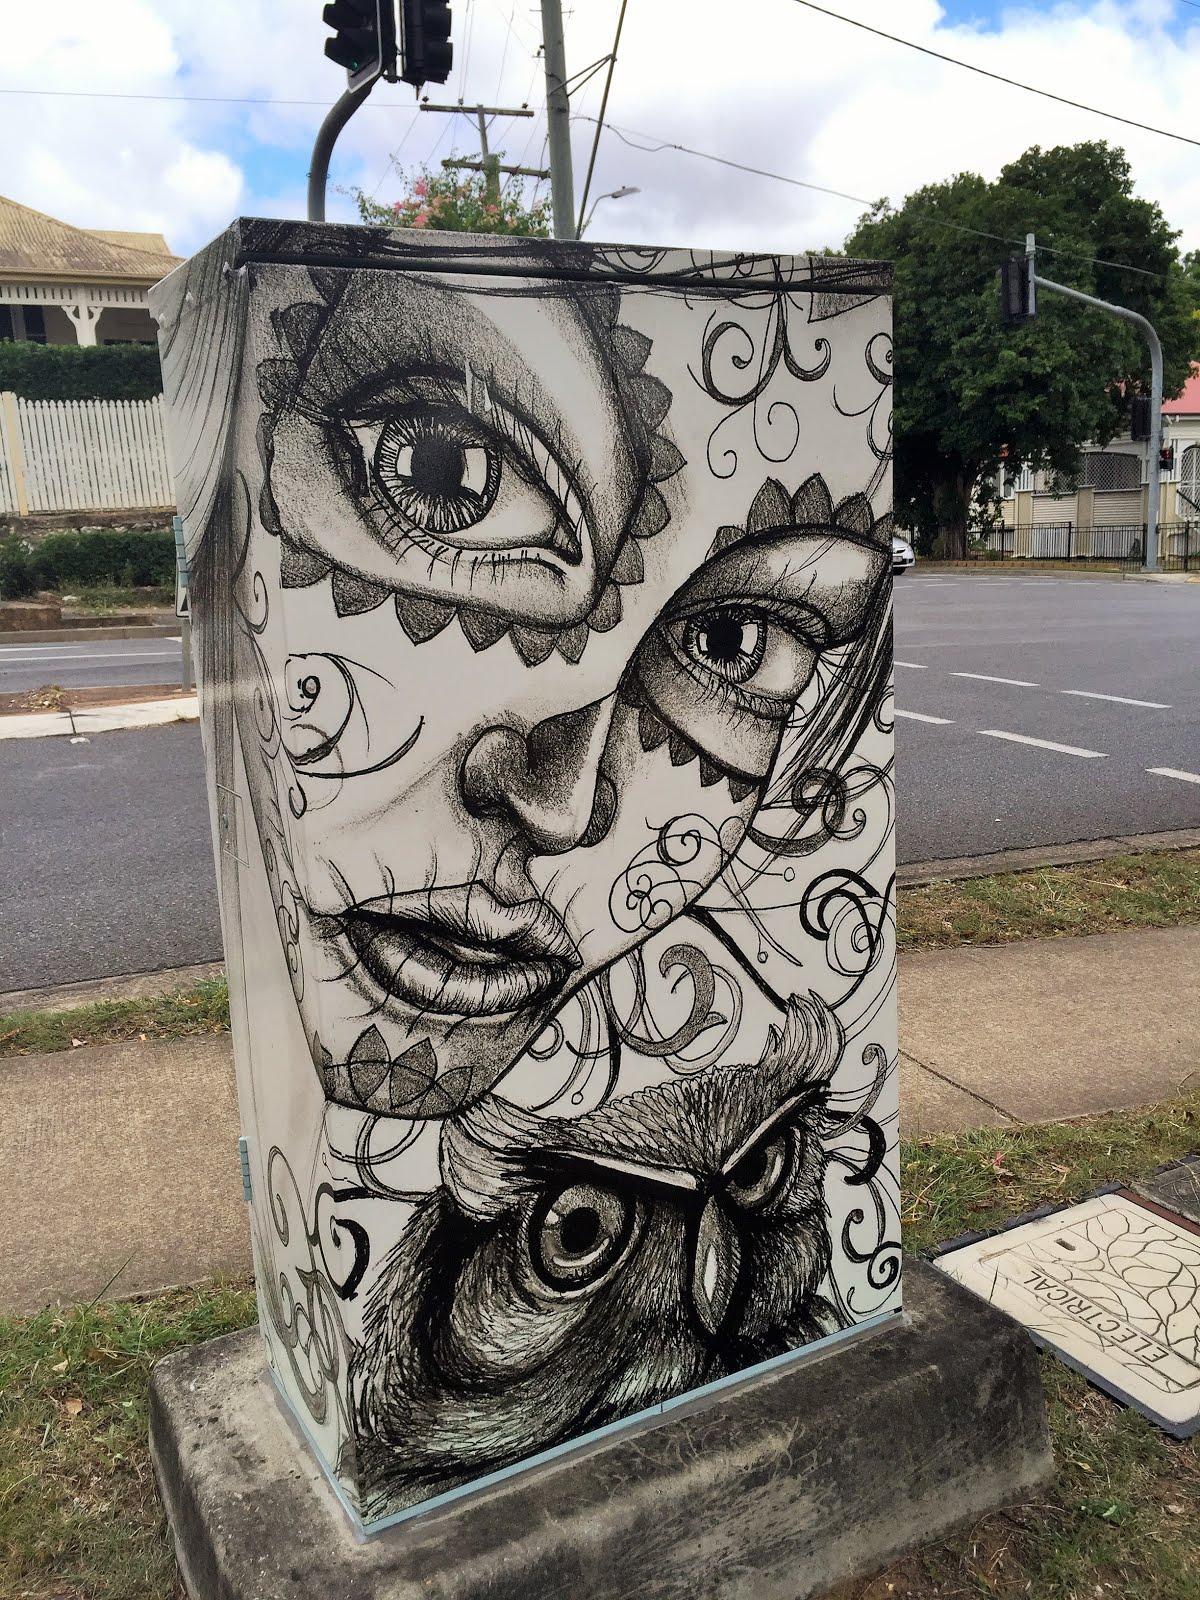 Stunning street art in ipswich